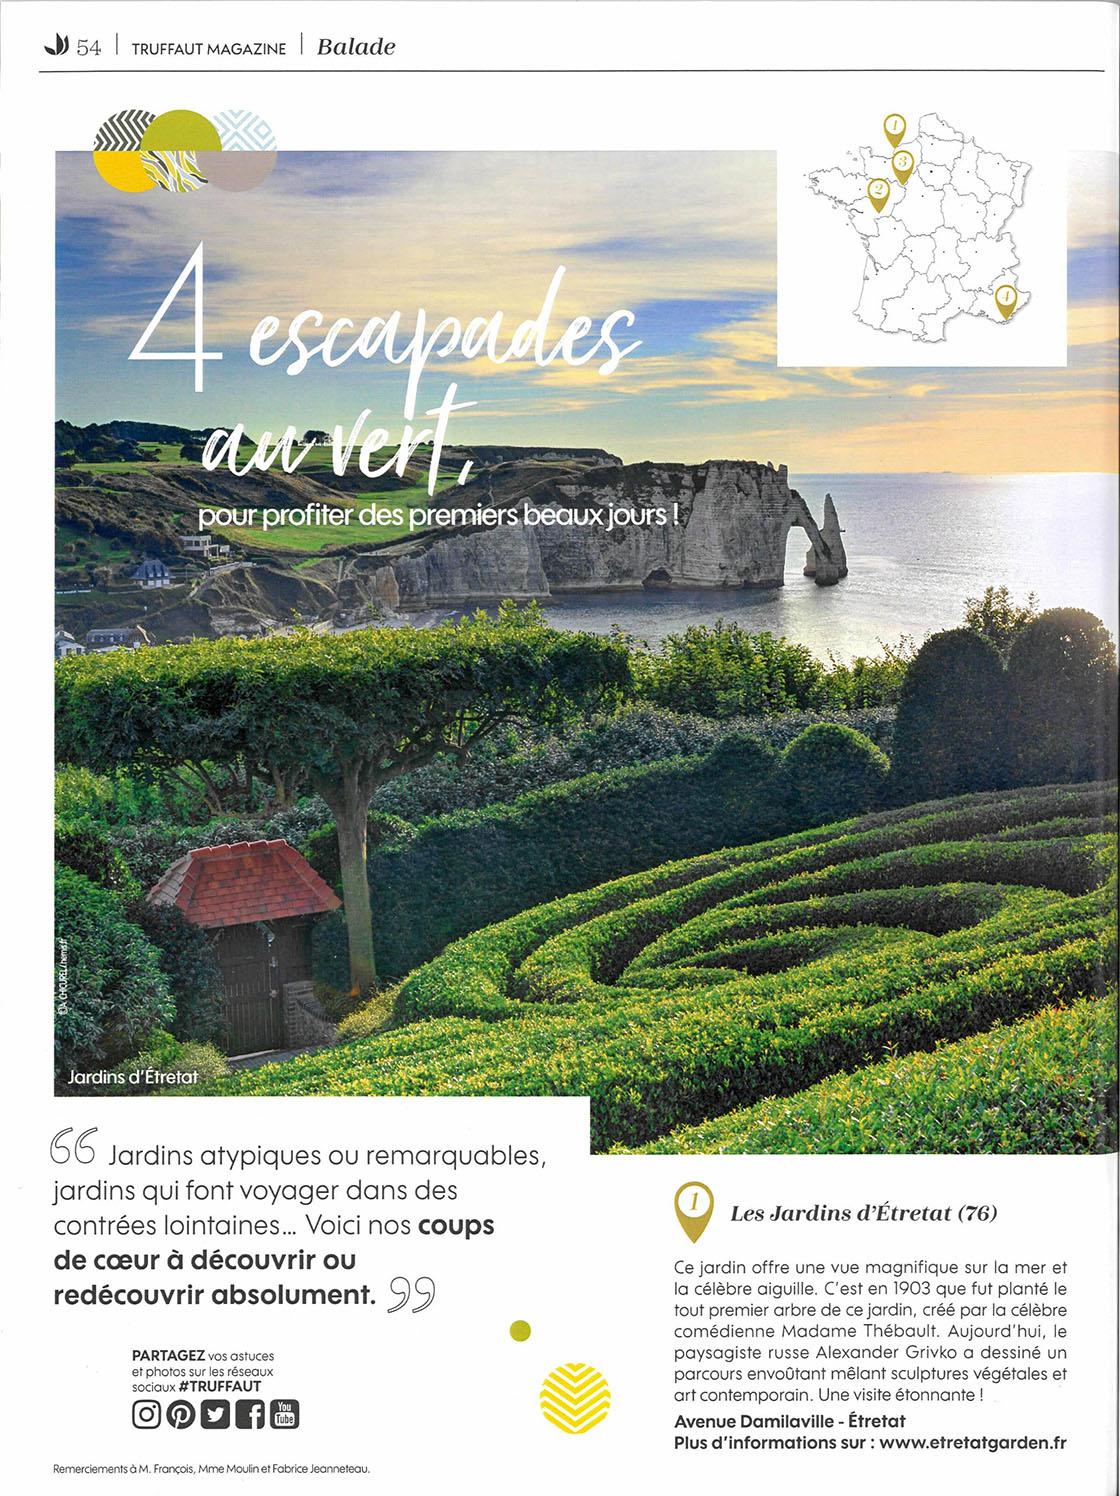 Les Jardins Du Moulin Paysagiste truffaut magazine